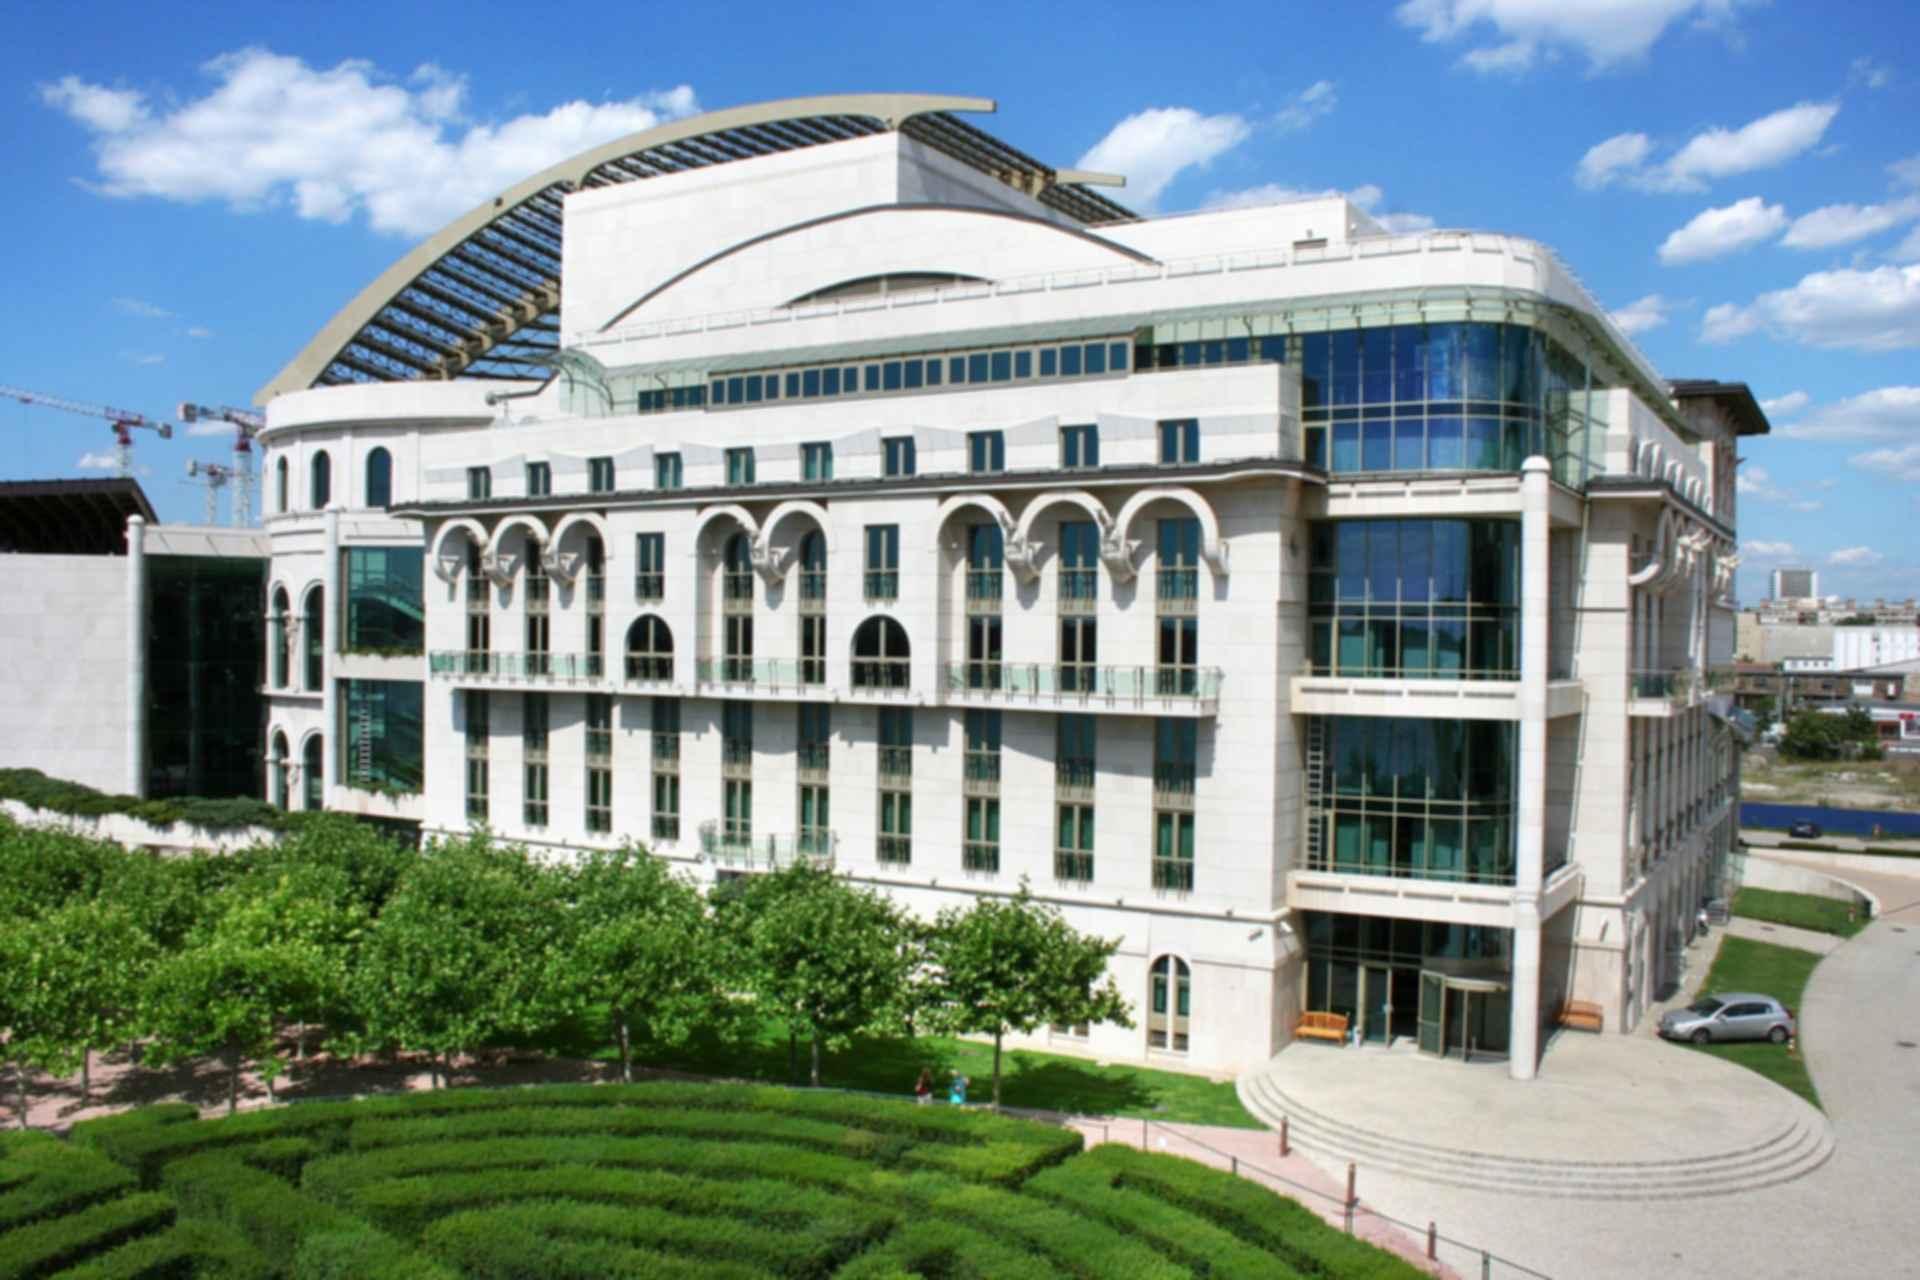 National Theatre Budapest - Exterior